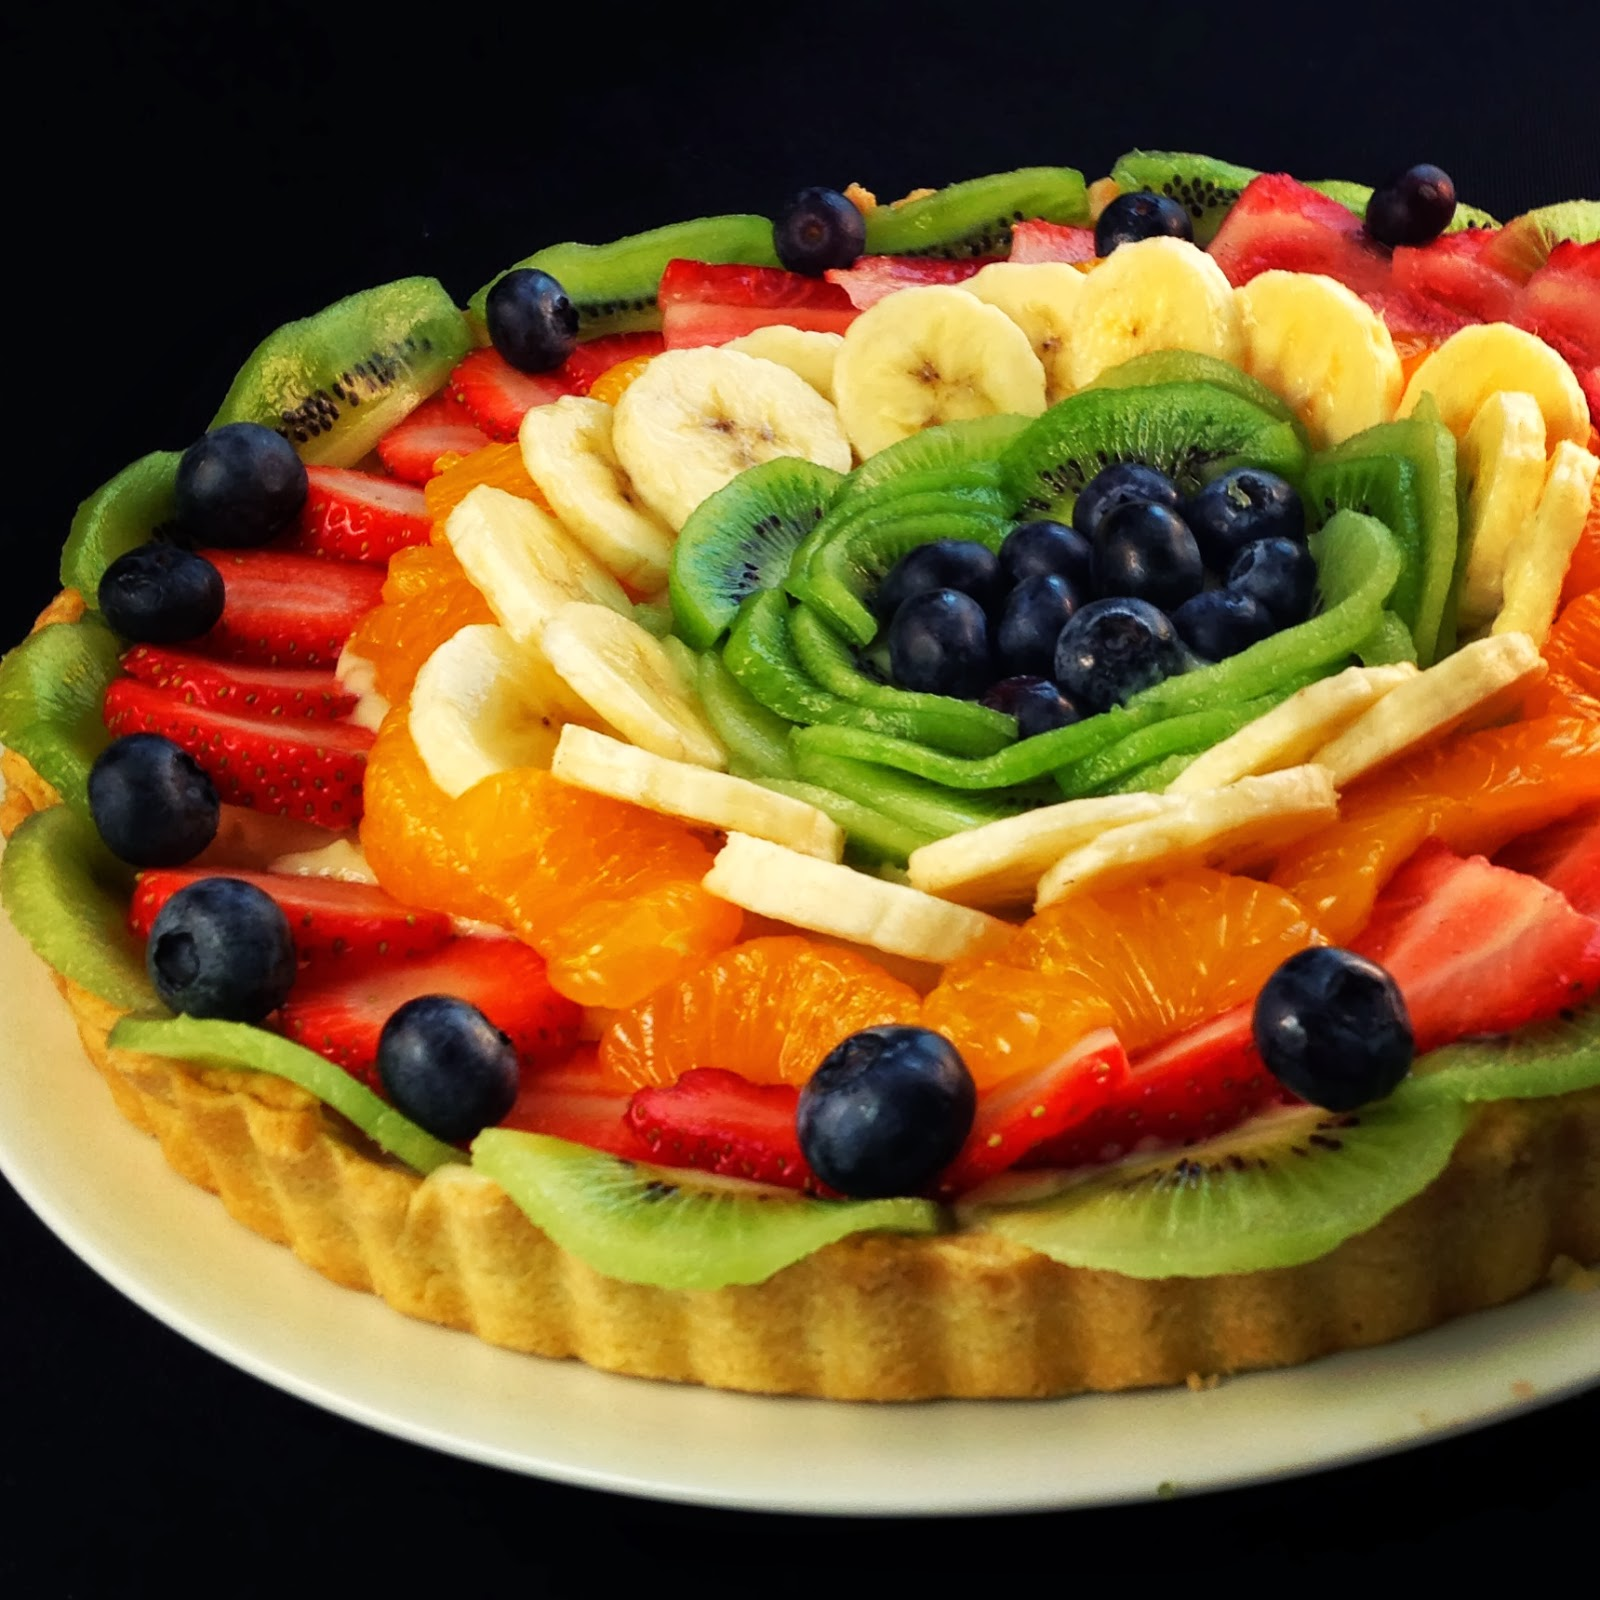 Gourmet Food Photography